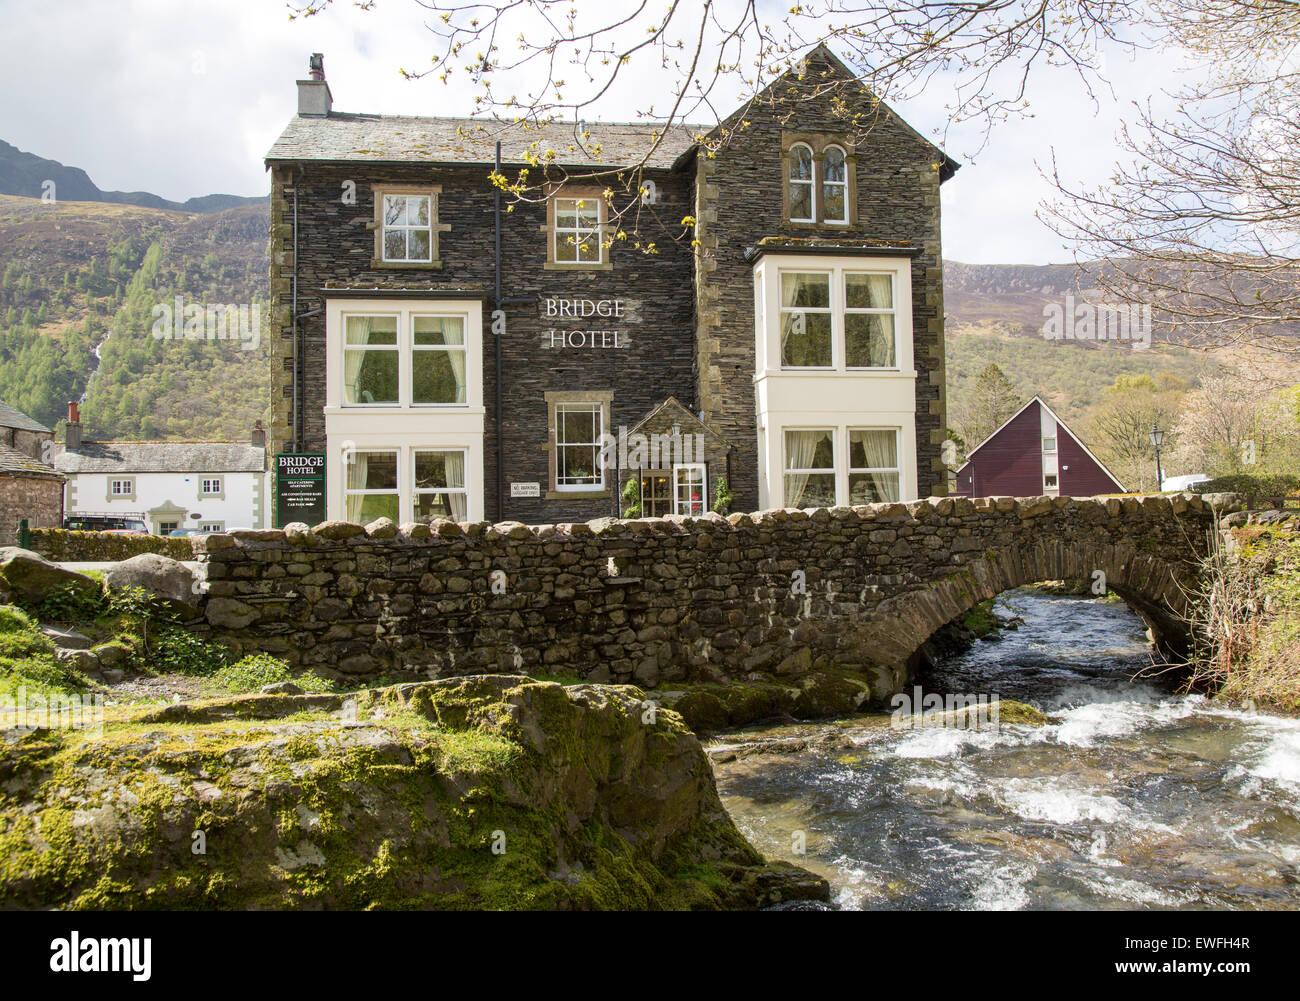 The Bridge hotel, Buttermere village, Cumbria, England, UK - Stock Image